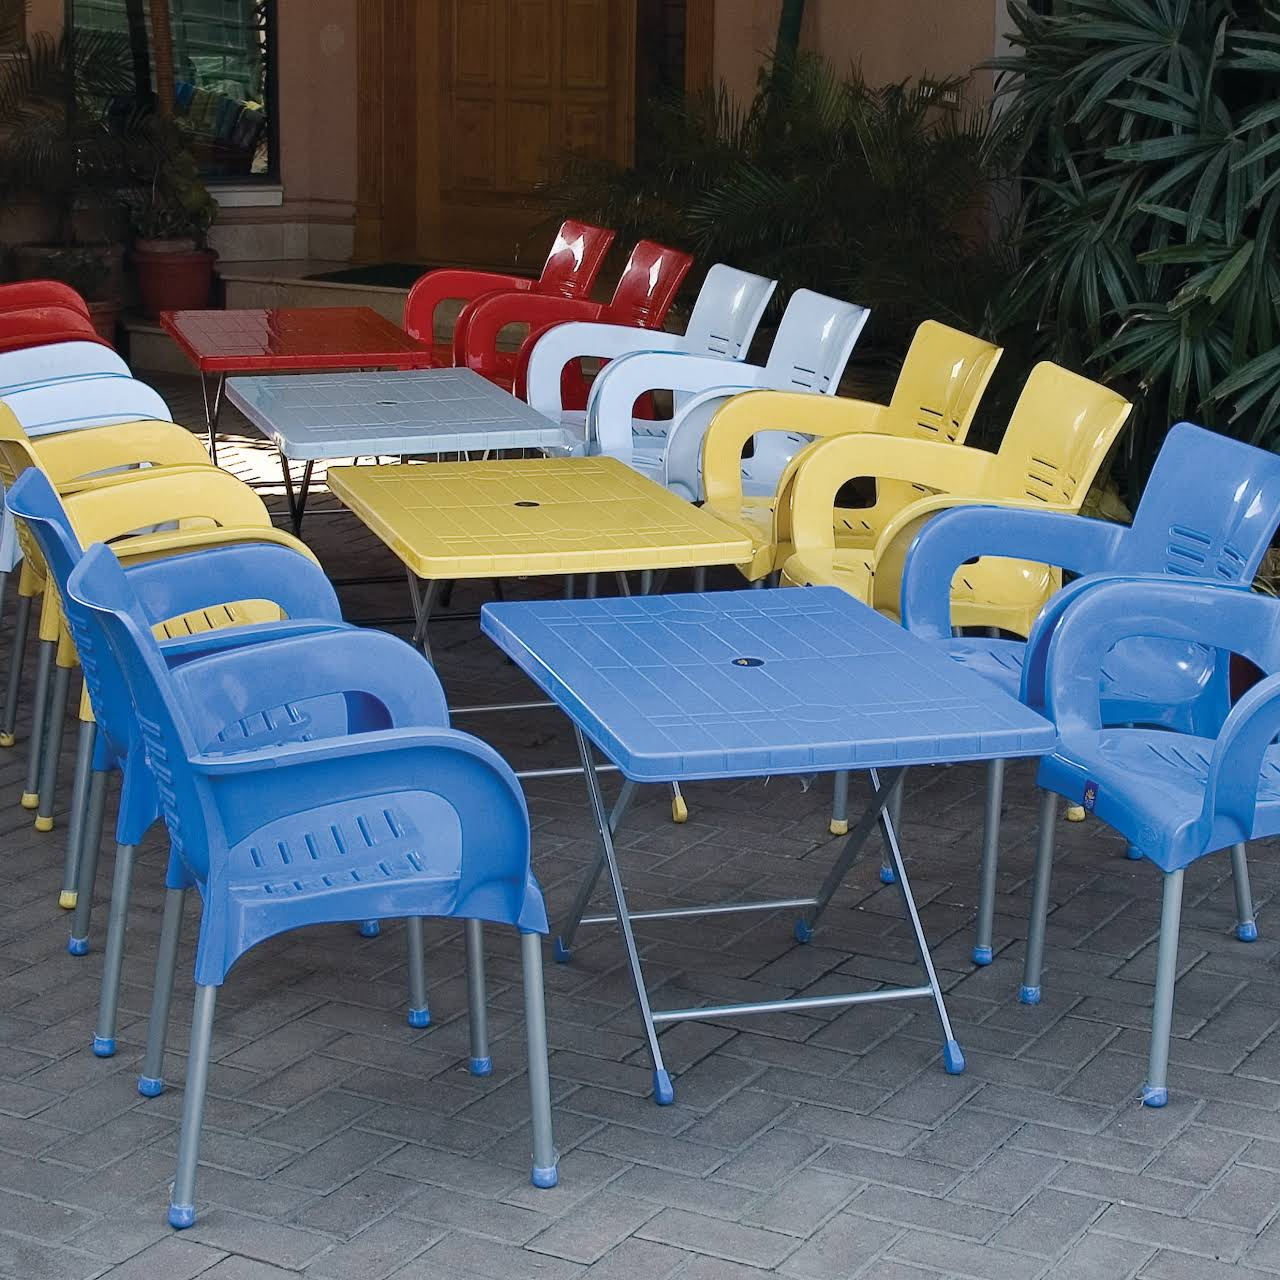 · universal furniture light brown color 5 seater bamboo cane sofa set. Cool Boss Plastic Sofa Set Price In Pakistan - Carin Scat